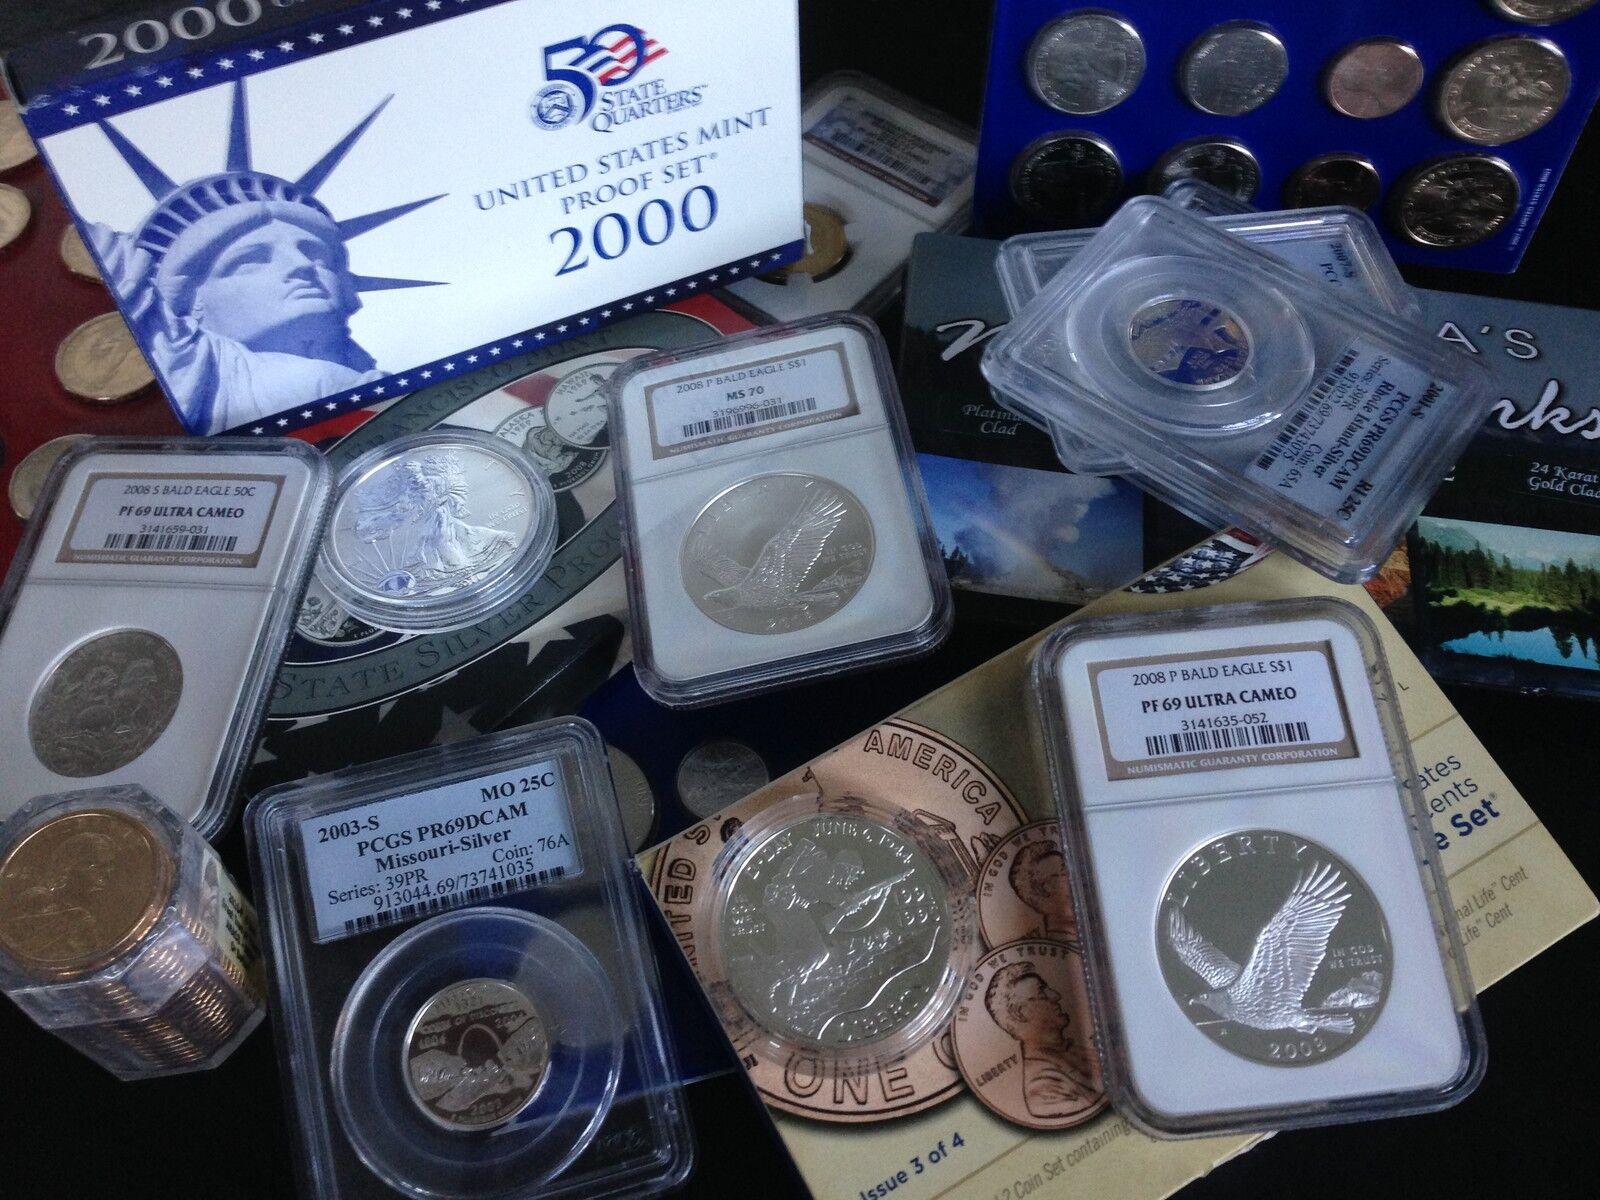 Lone Star Collectors Mint